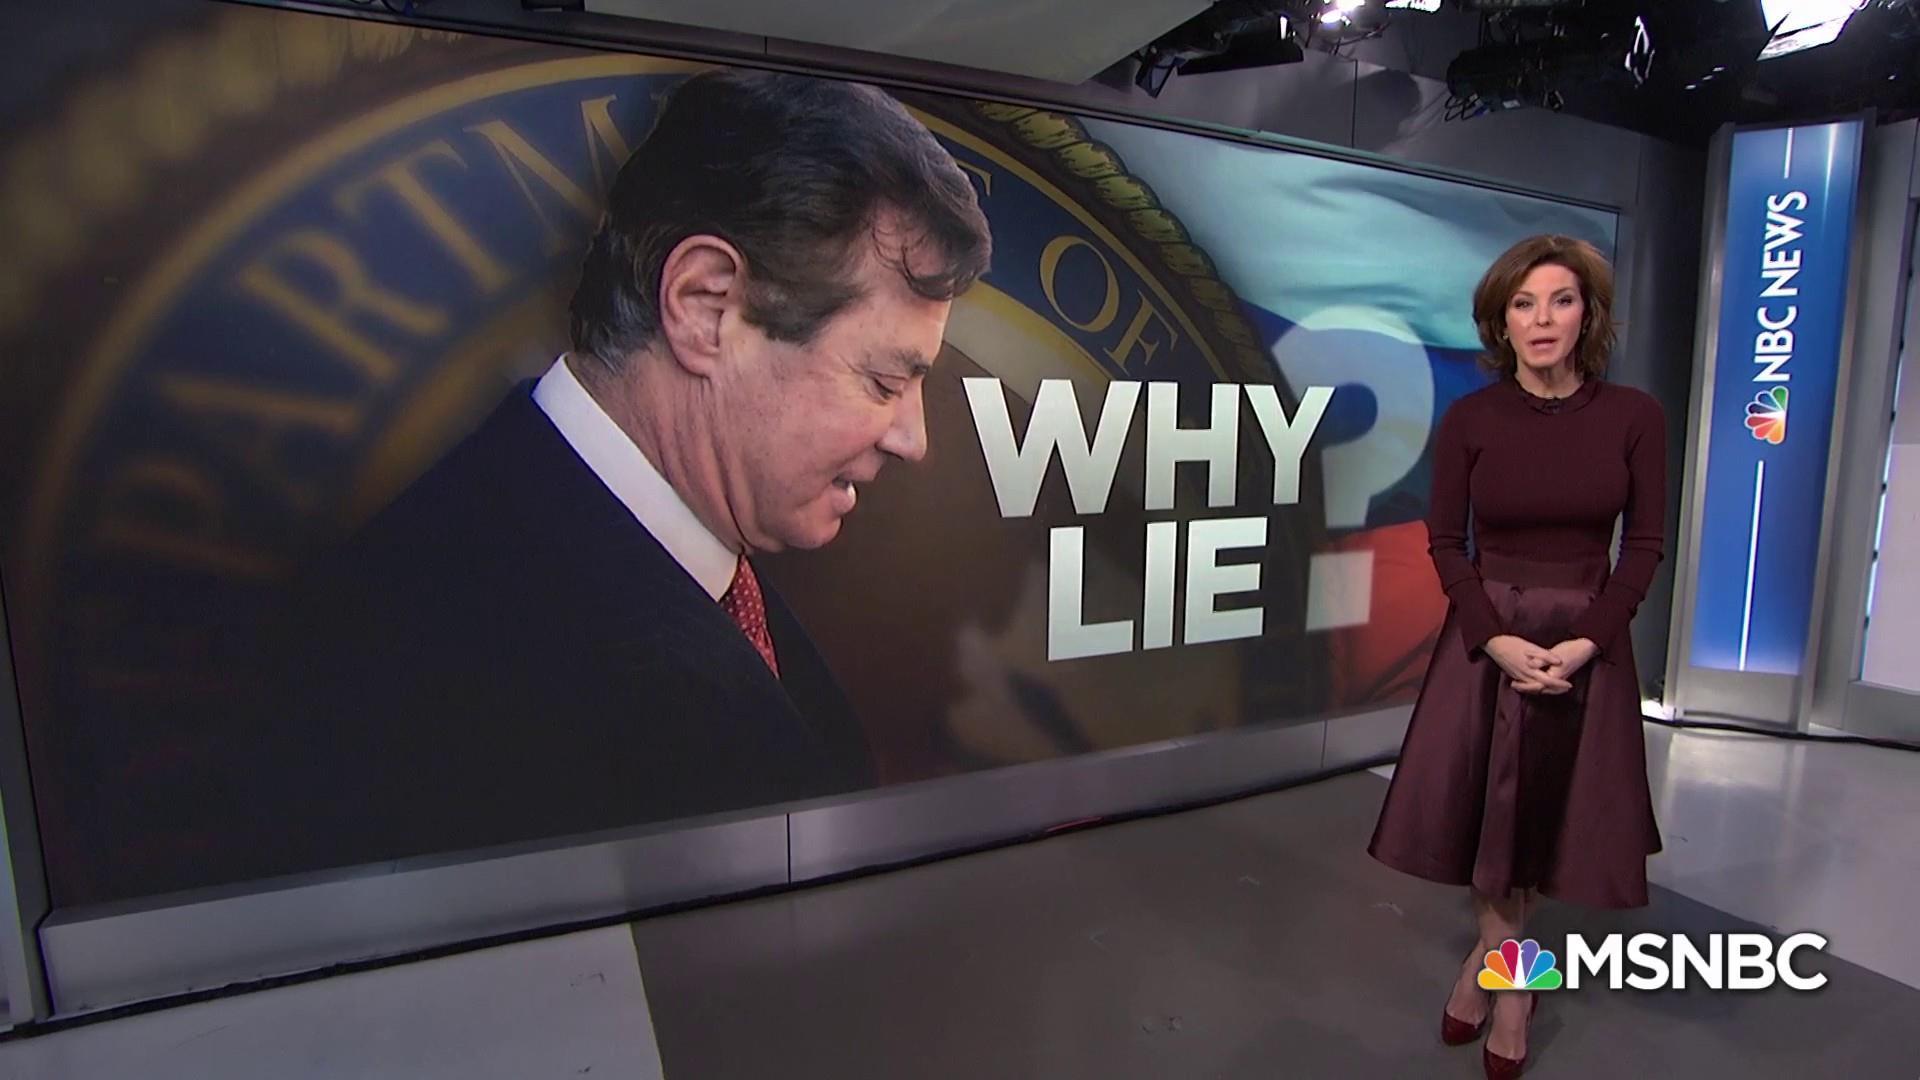 Why did Paul Manafort lie?